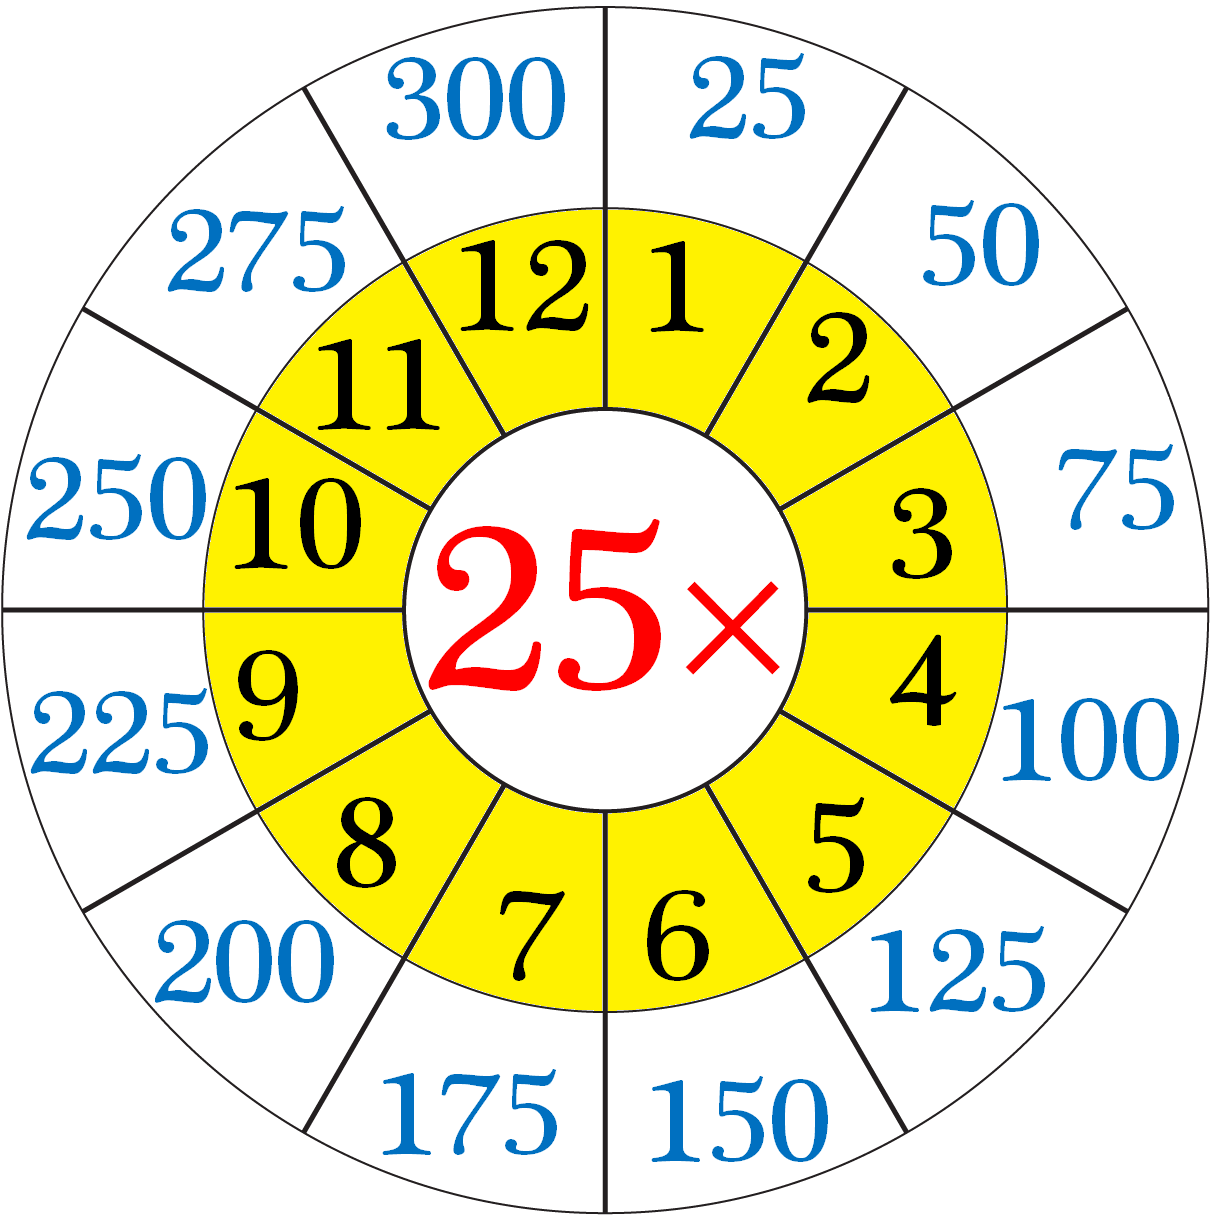 25 Multiplication Table Maths